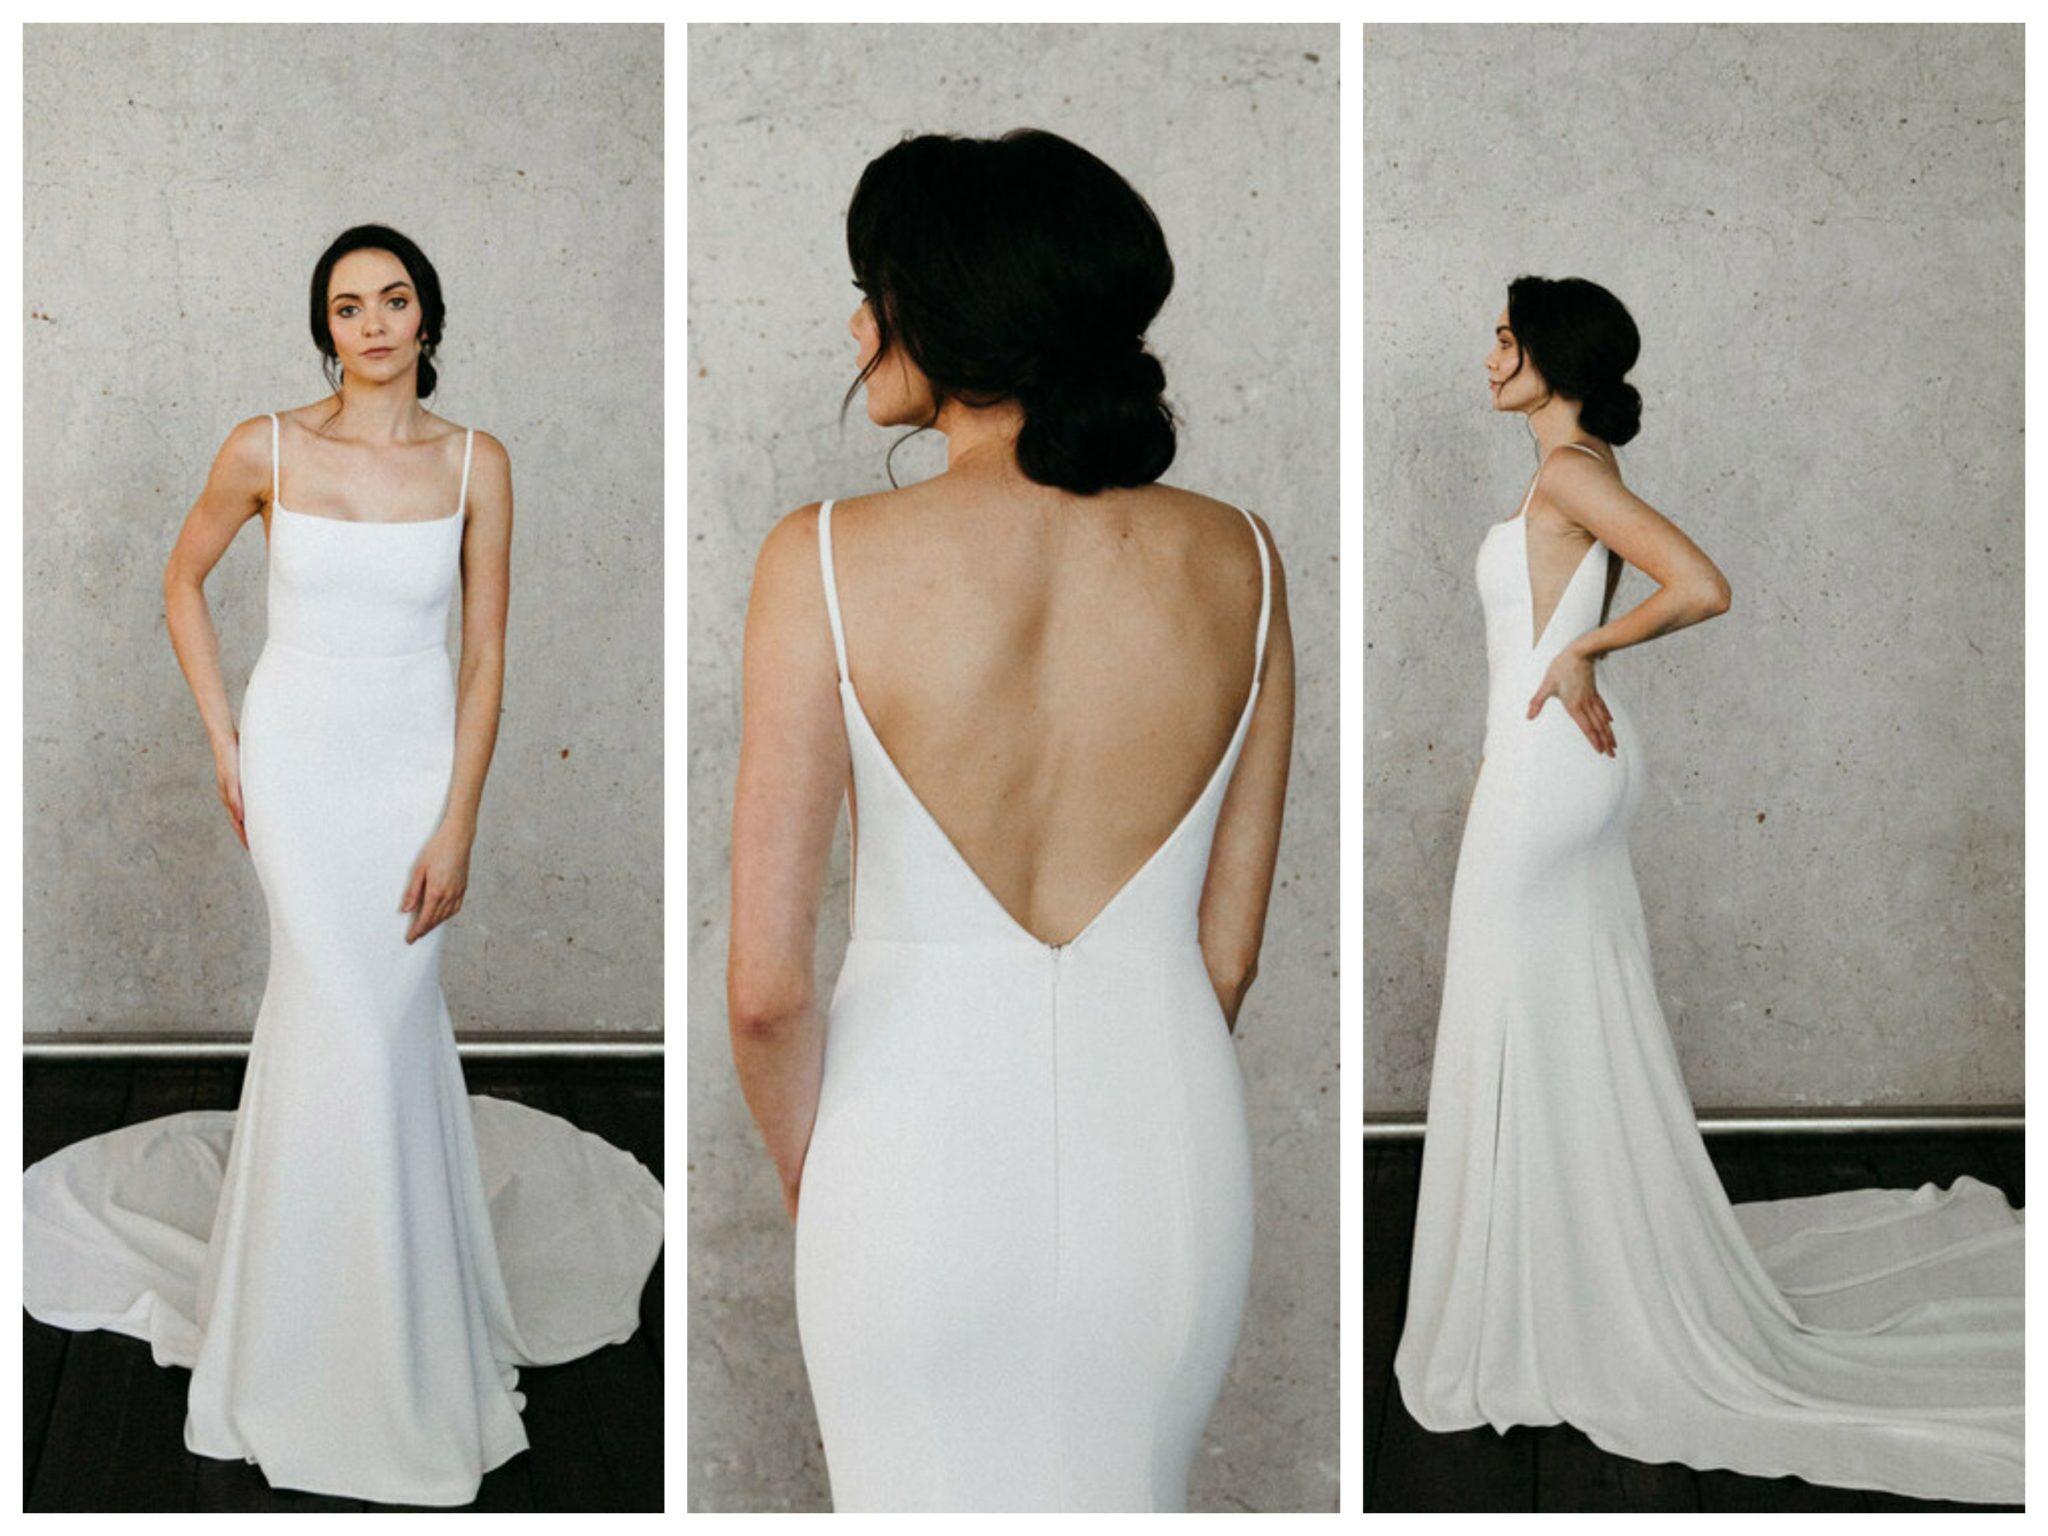 Wedding dresses for broad shoulders by top Los Angeles bridal shop, Love and Lace Bridal Salon: Alyssa Kristin's Nathalie